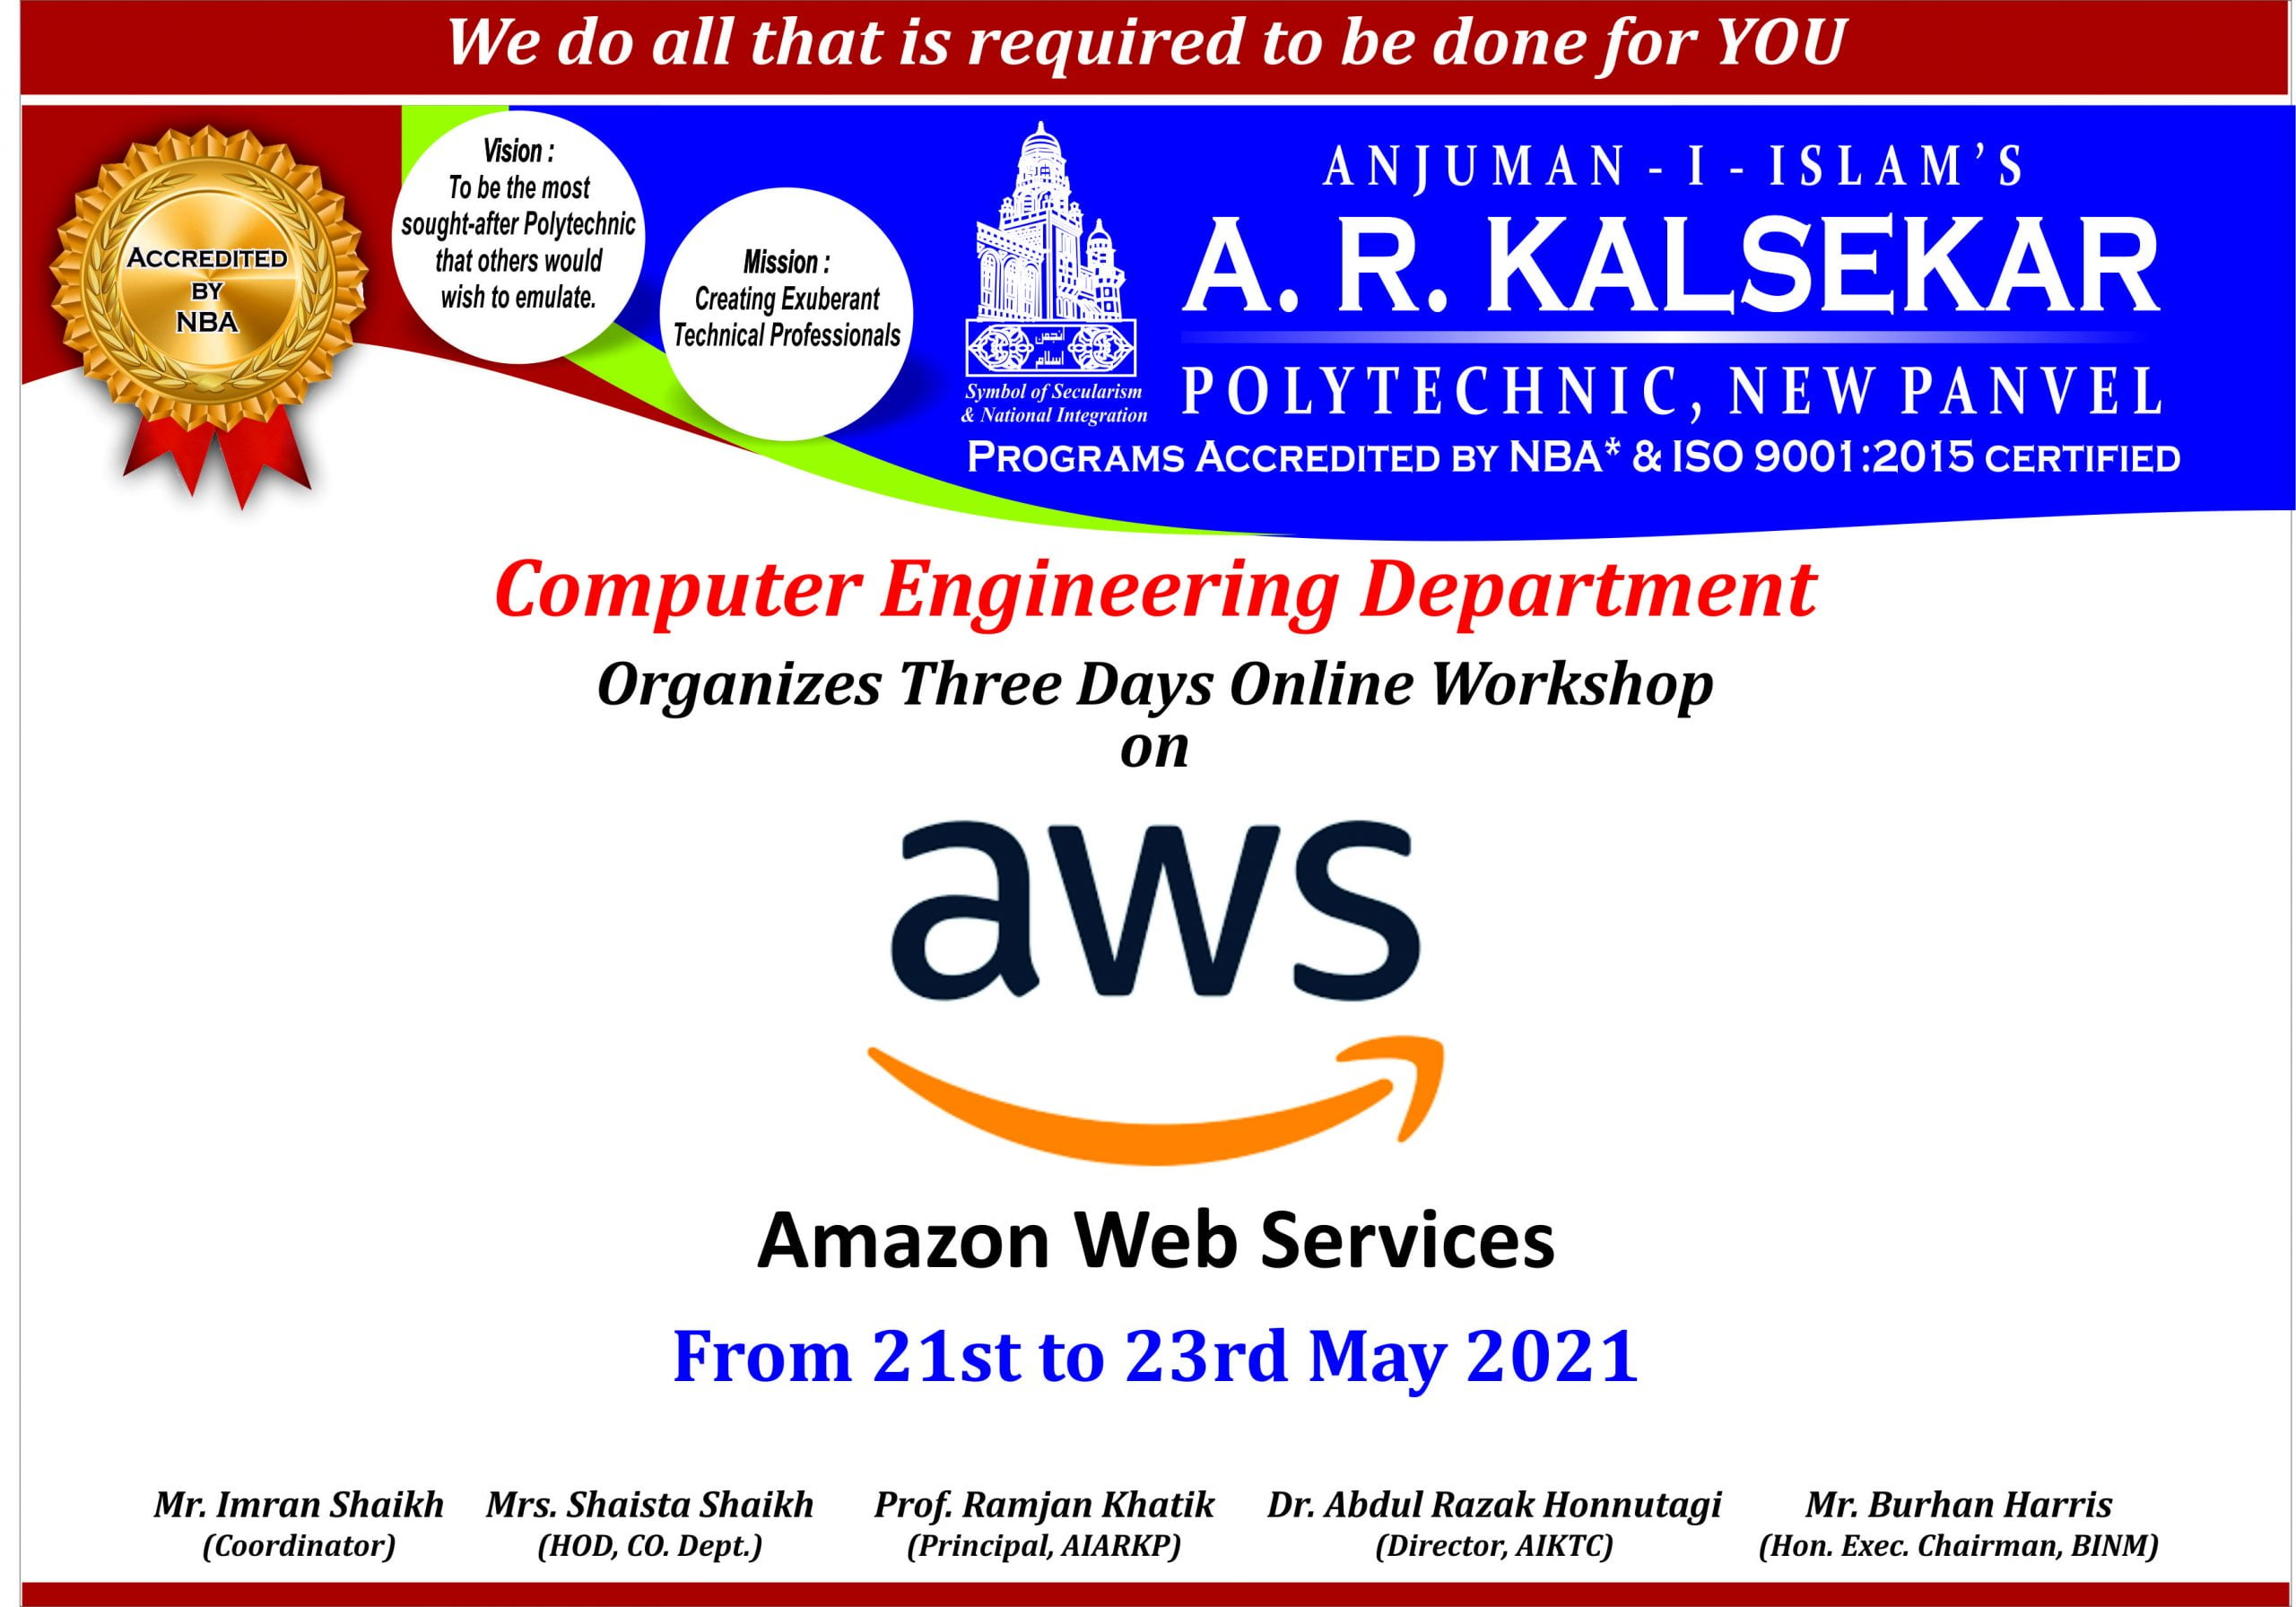 3 Days Online Workshop on AWS-Amazon Web Services